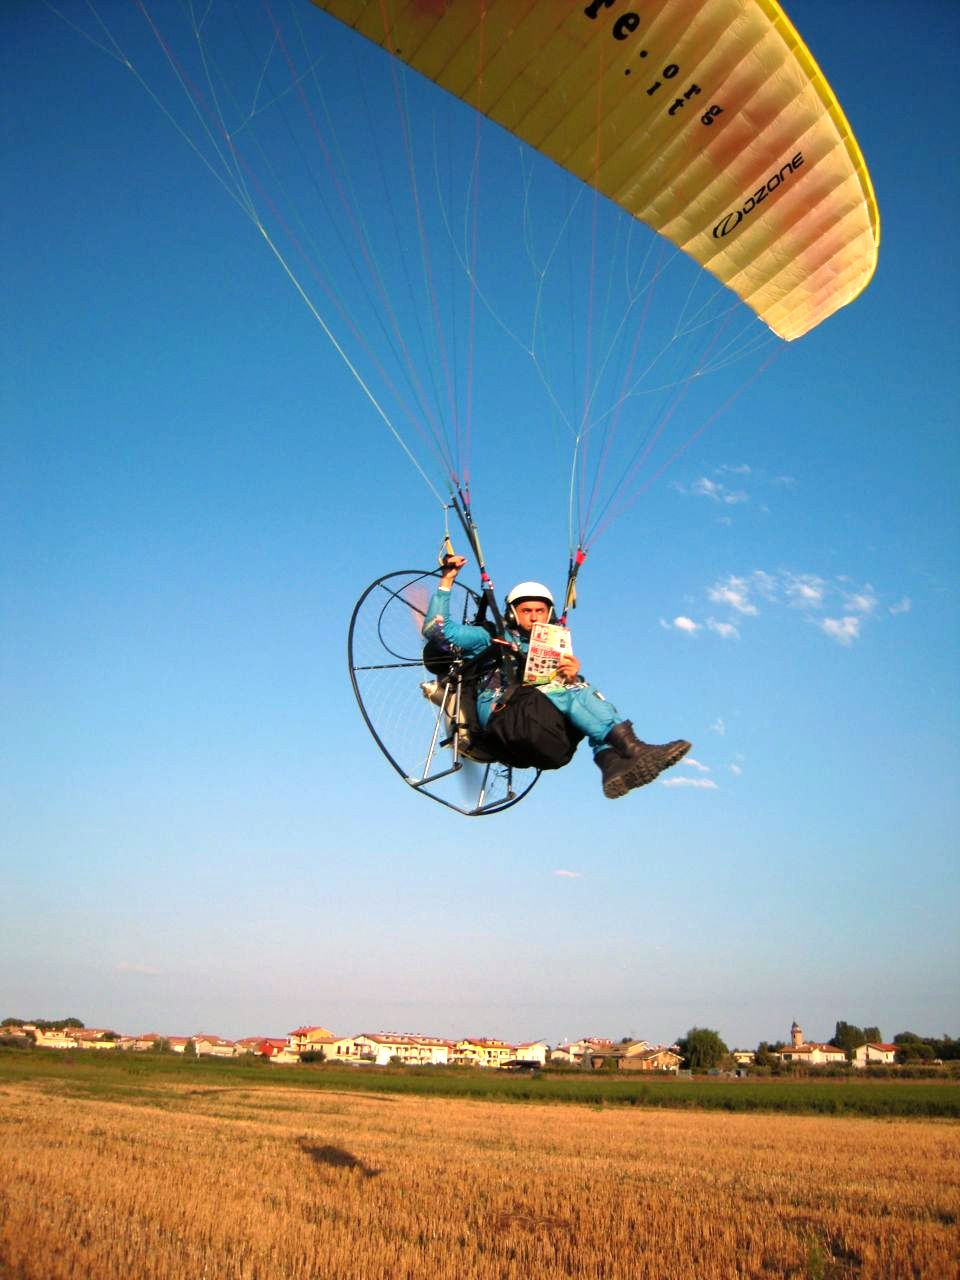 Volo Paramotore Paracarrello Italia Paramotor